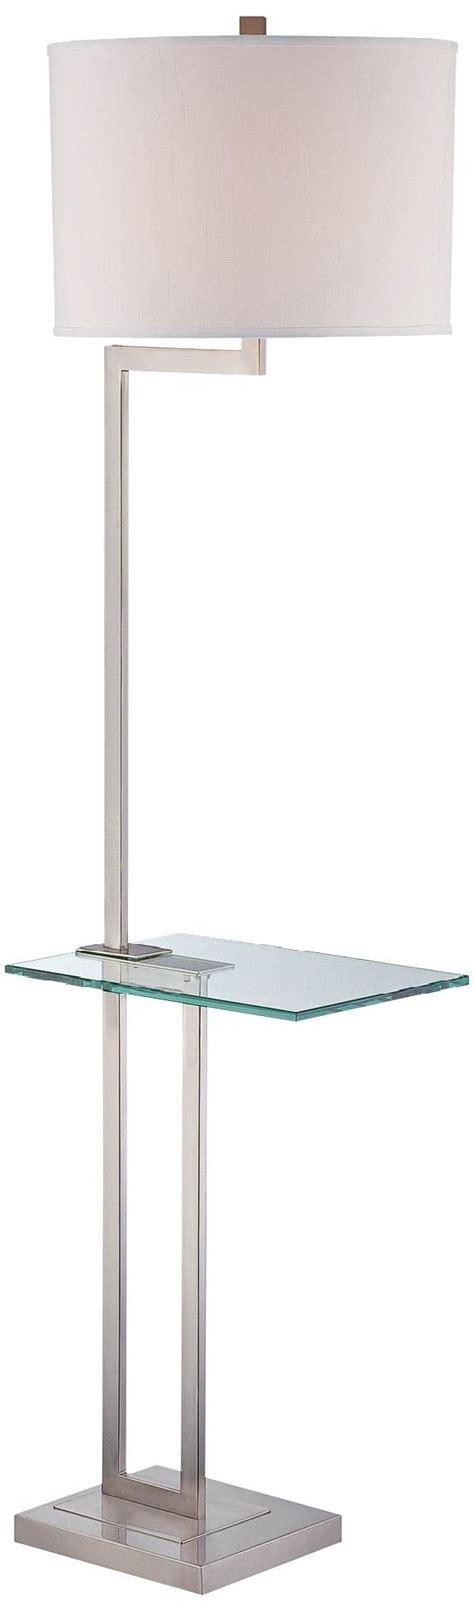 glass tray floor l 84 best lighting floor l images on pinterest floor